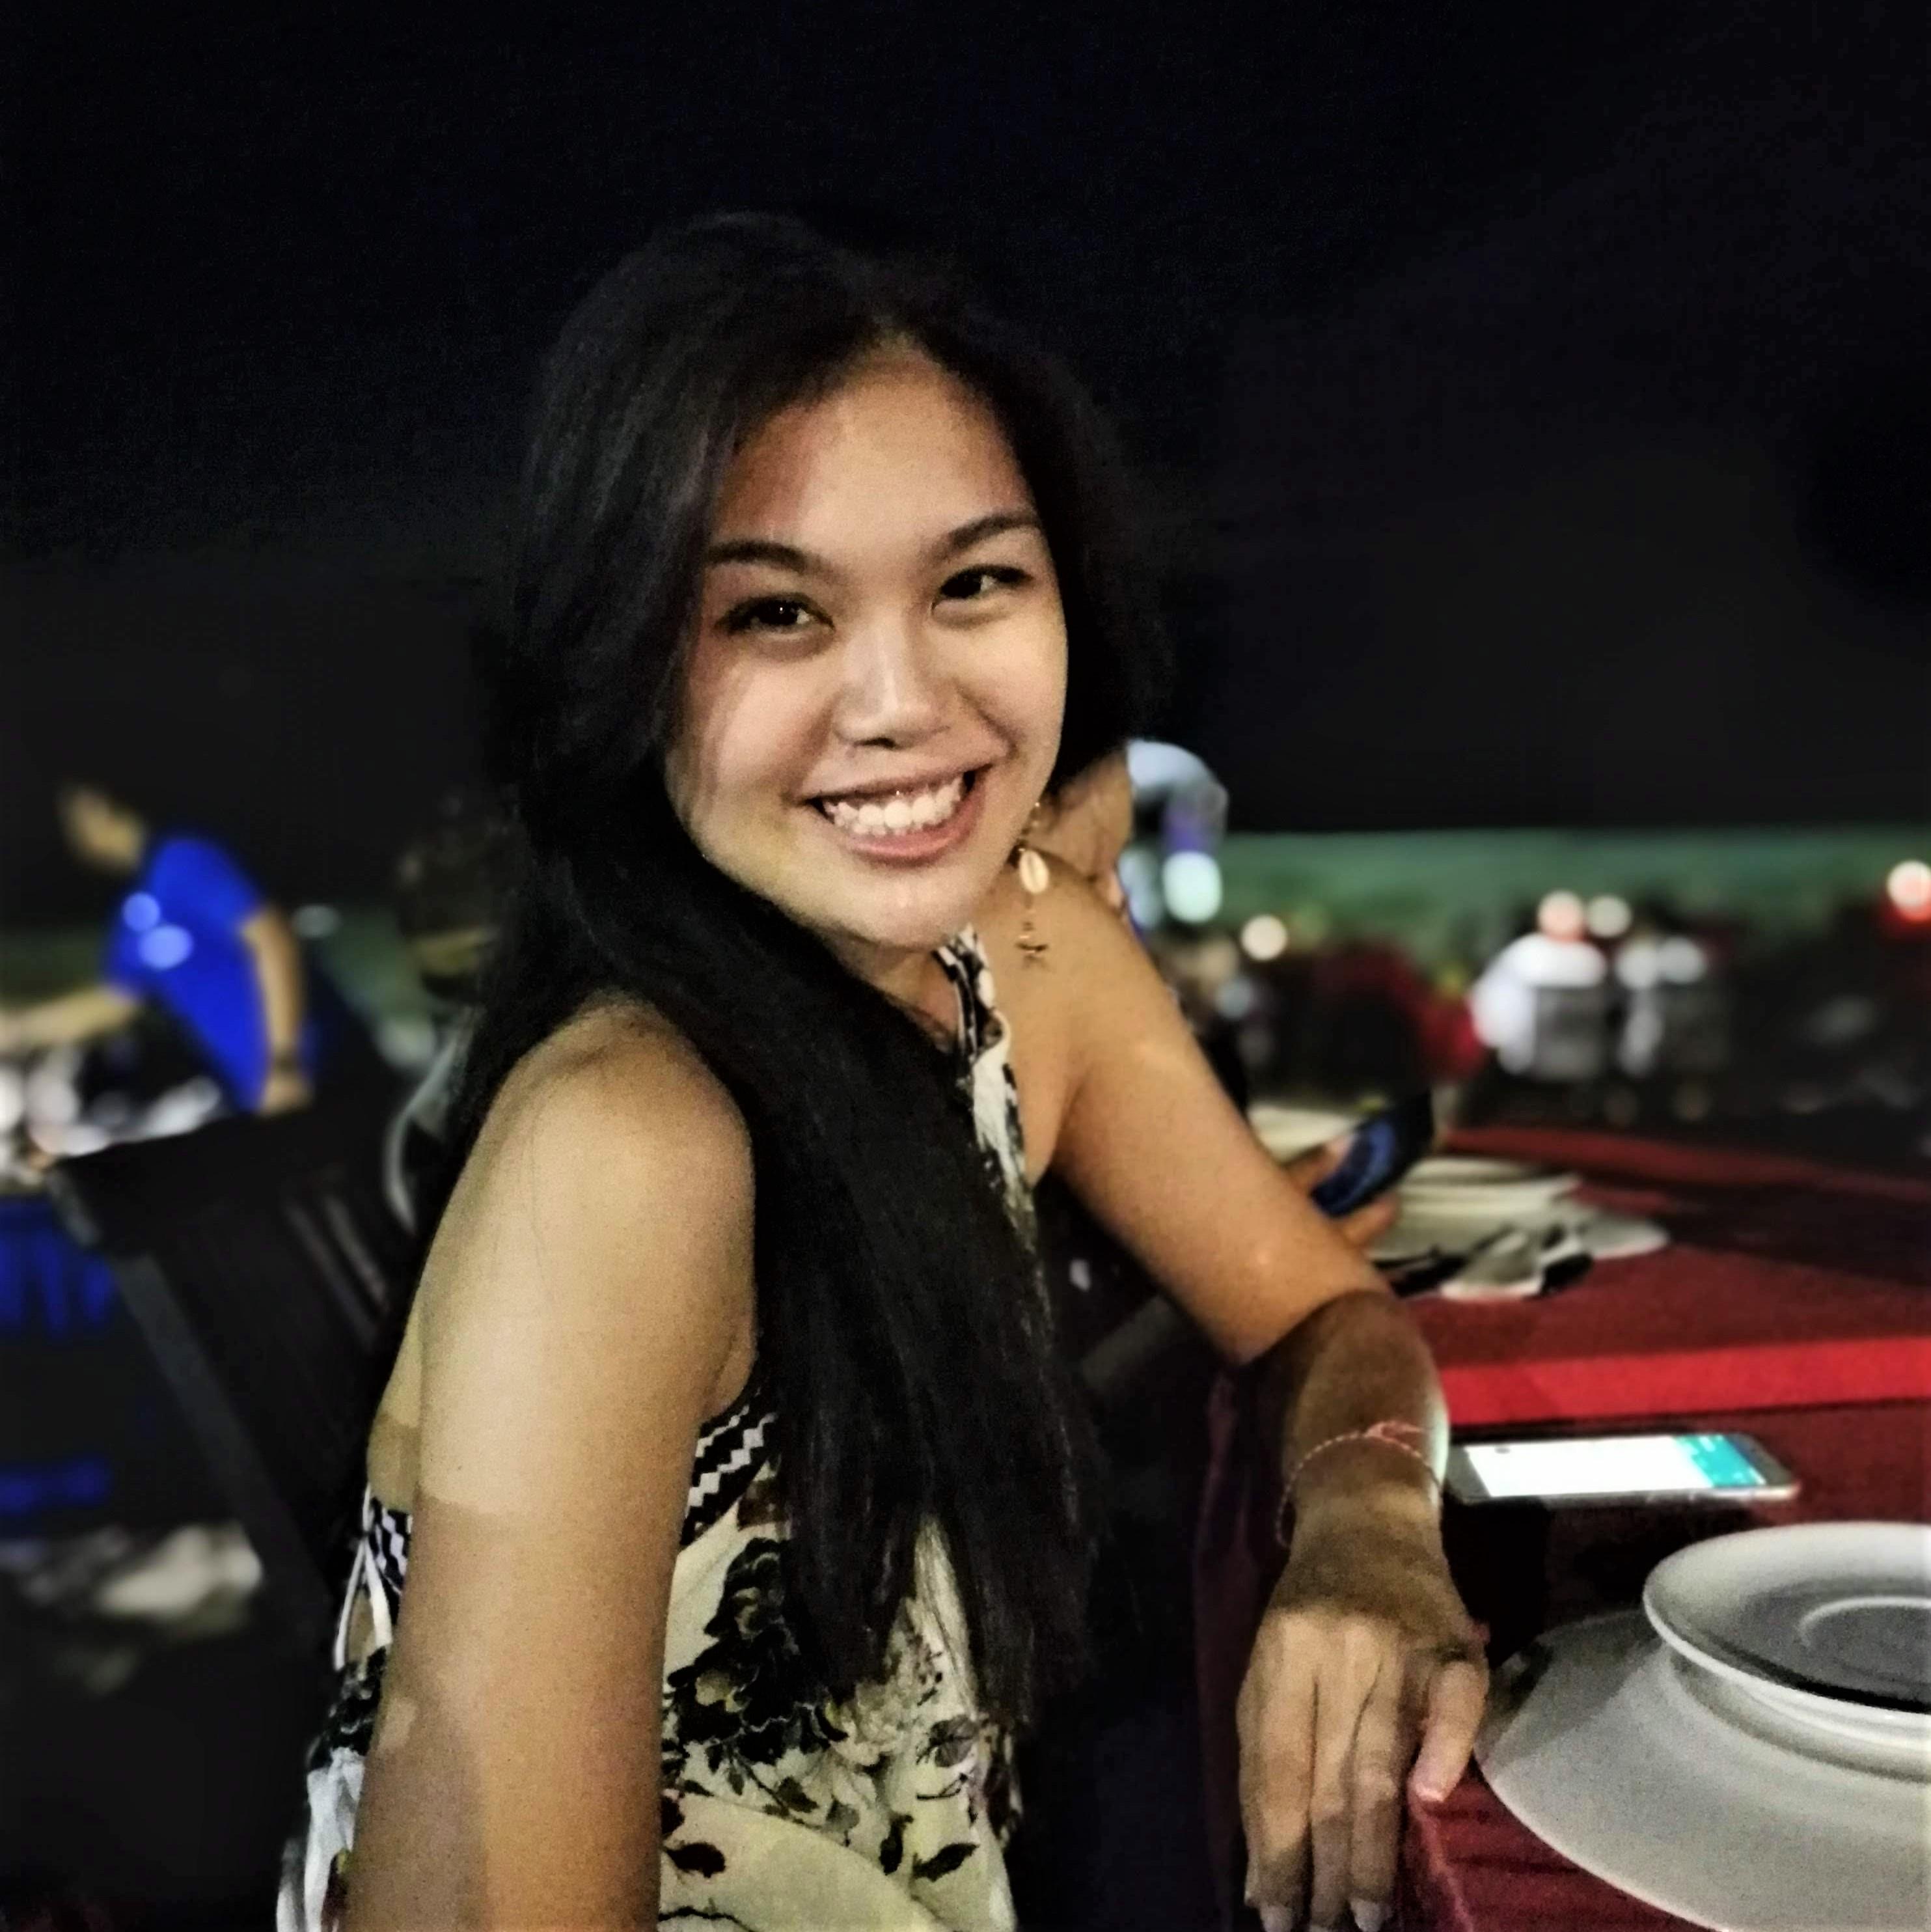 Cheryl Teo